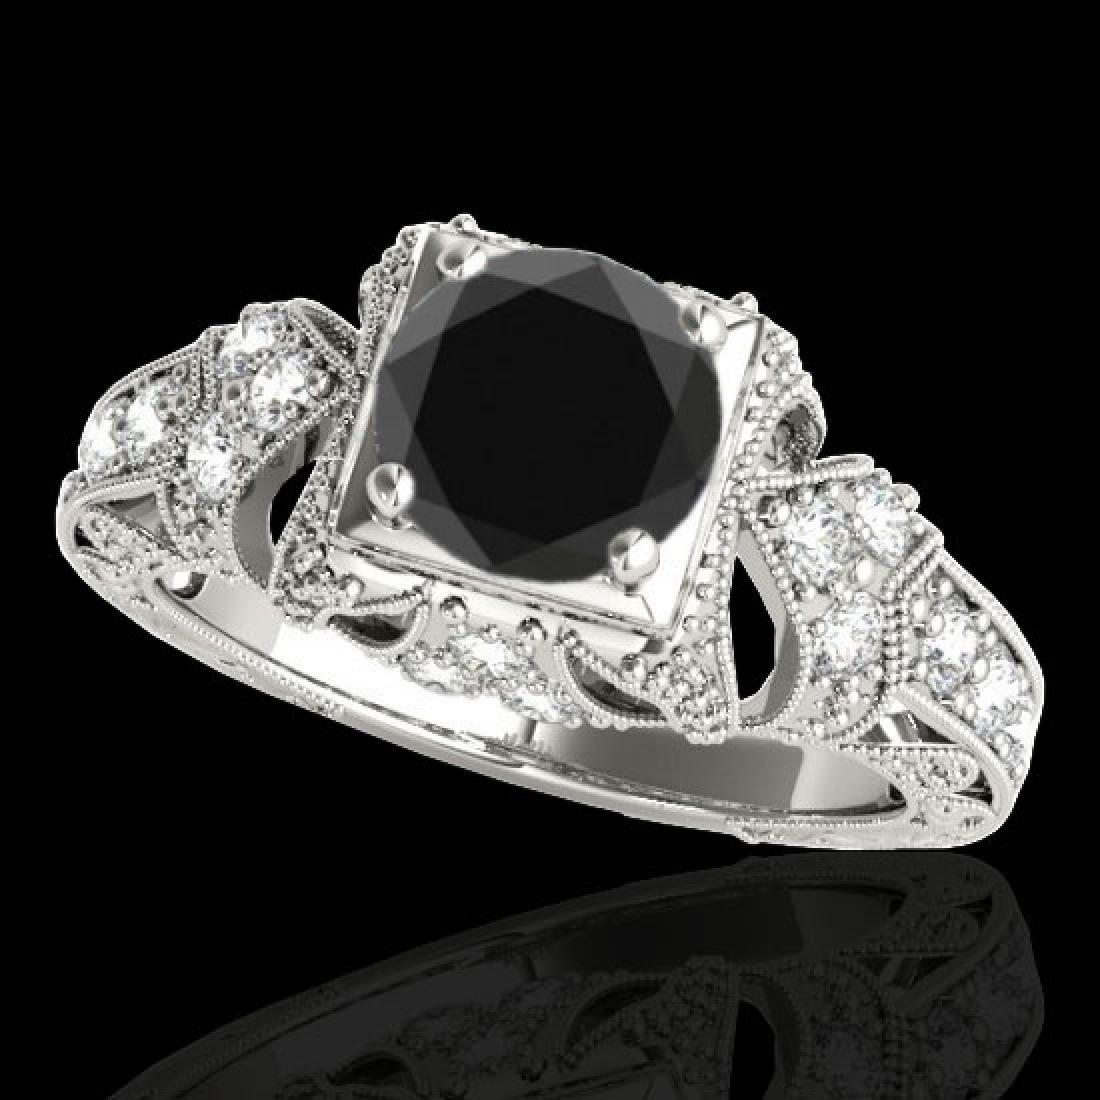 1.25 CTW Certified VS Black Diamond Solitaire Antique